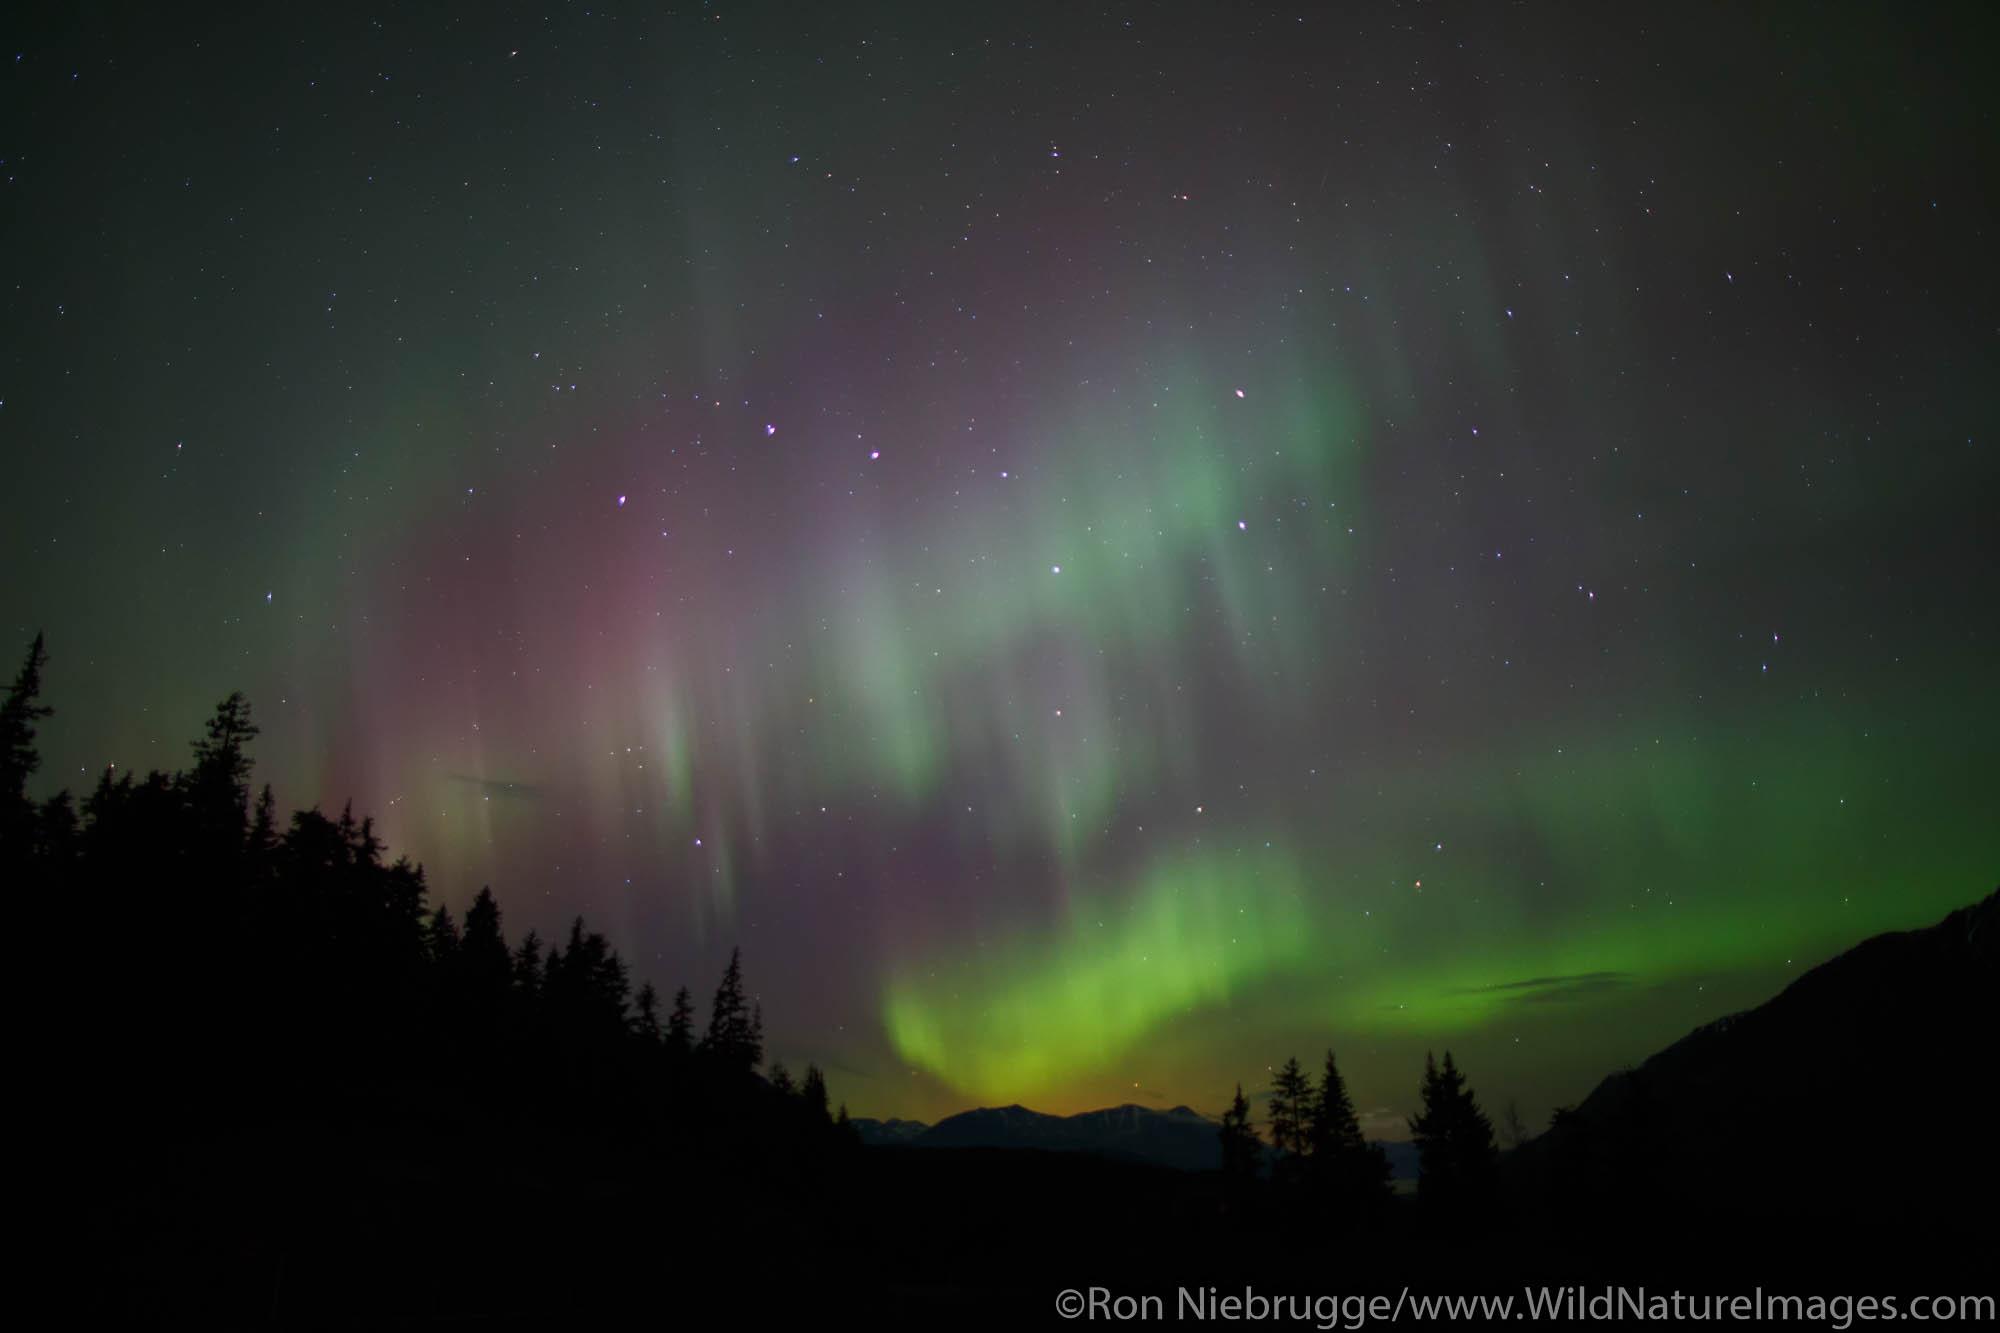 Northern Lights over the Chugach National Forest, Alaska.